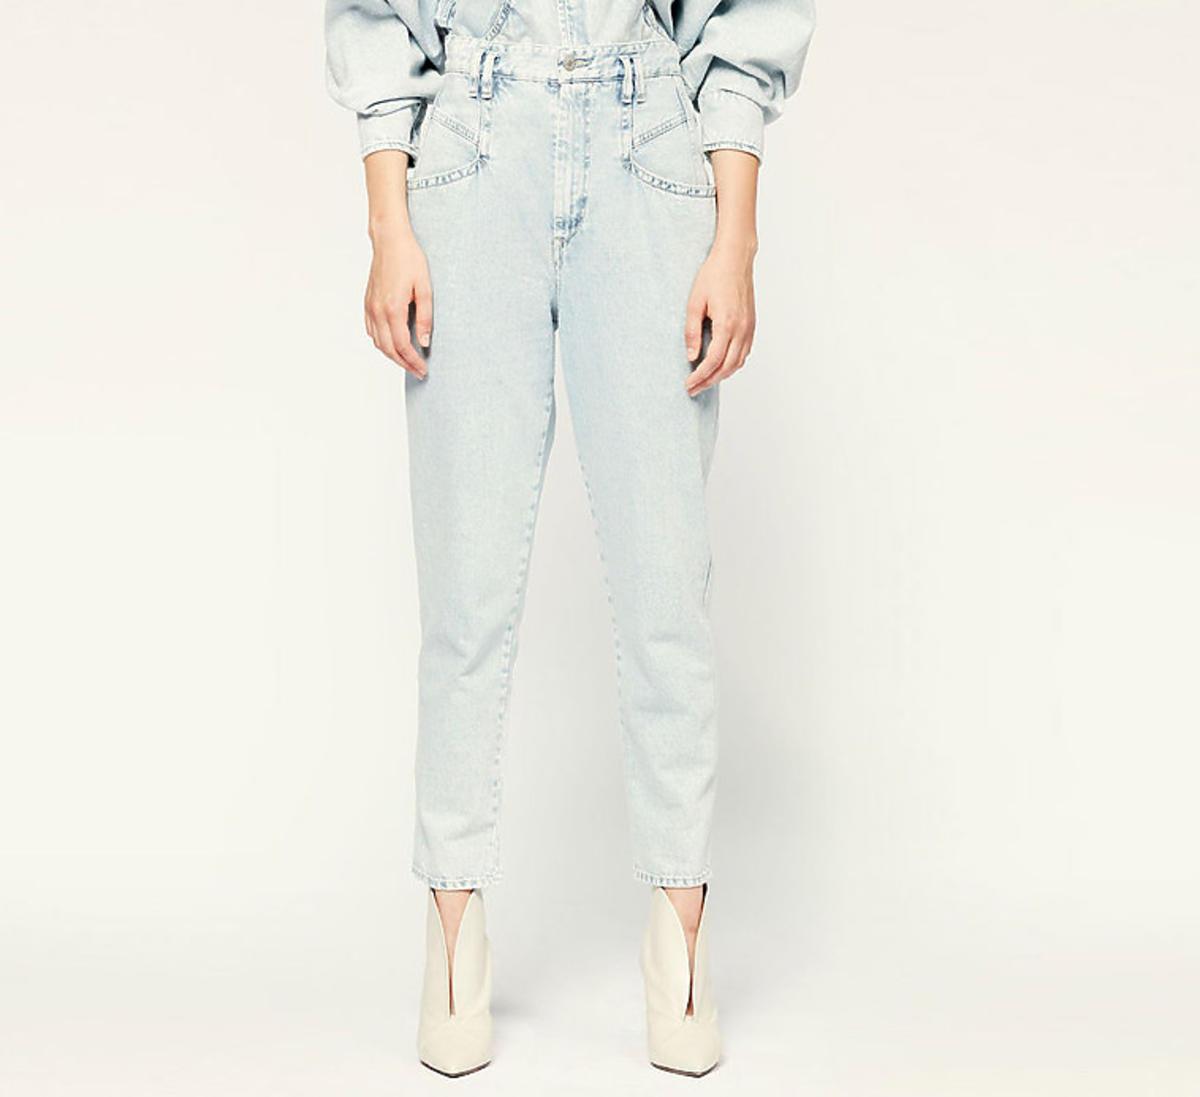 Jasnoniebieskie jeansy Padeloisasr, Isabel Marant